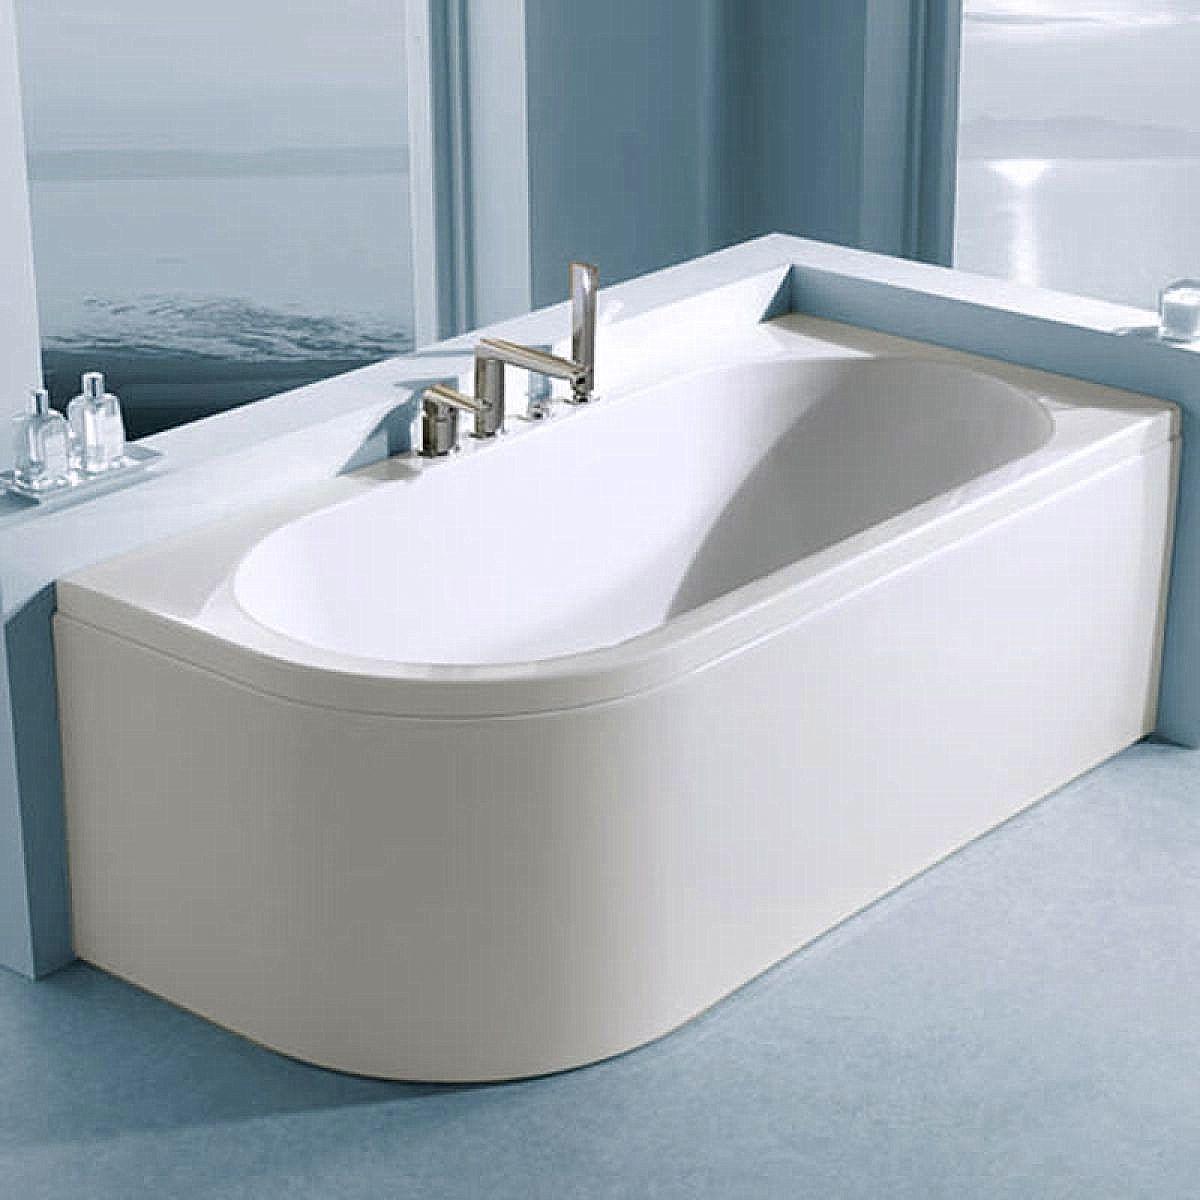 Carron Status Duo Offset Curved Bath UK Bathrooms